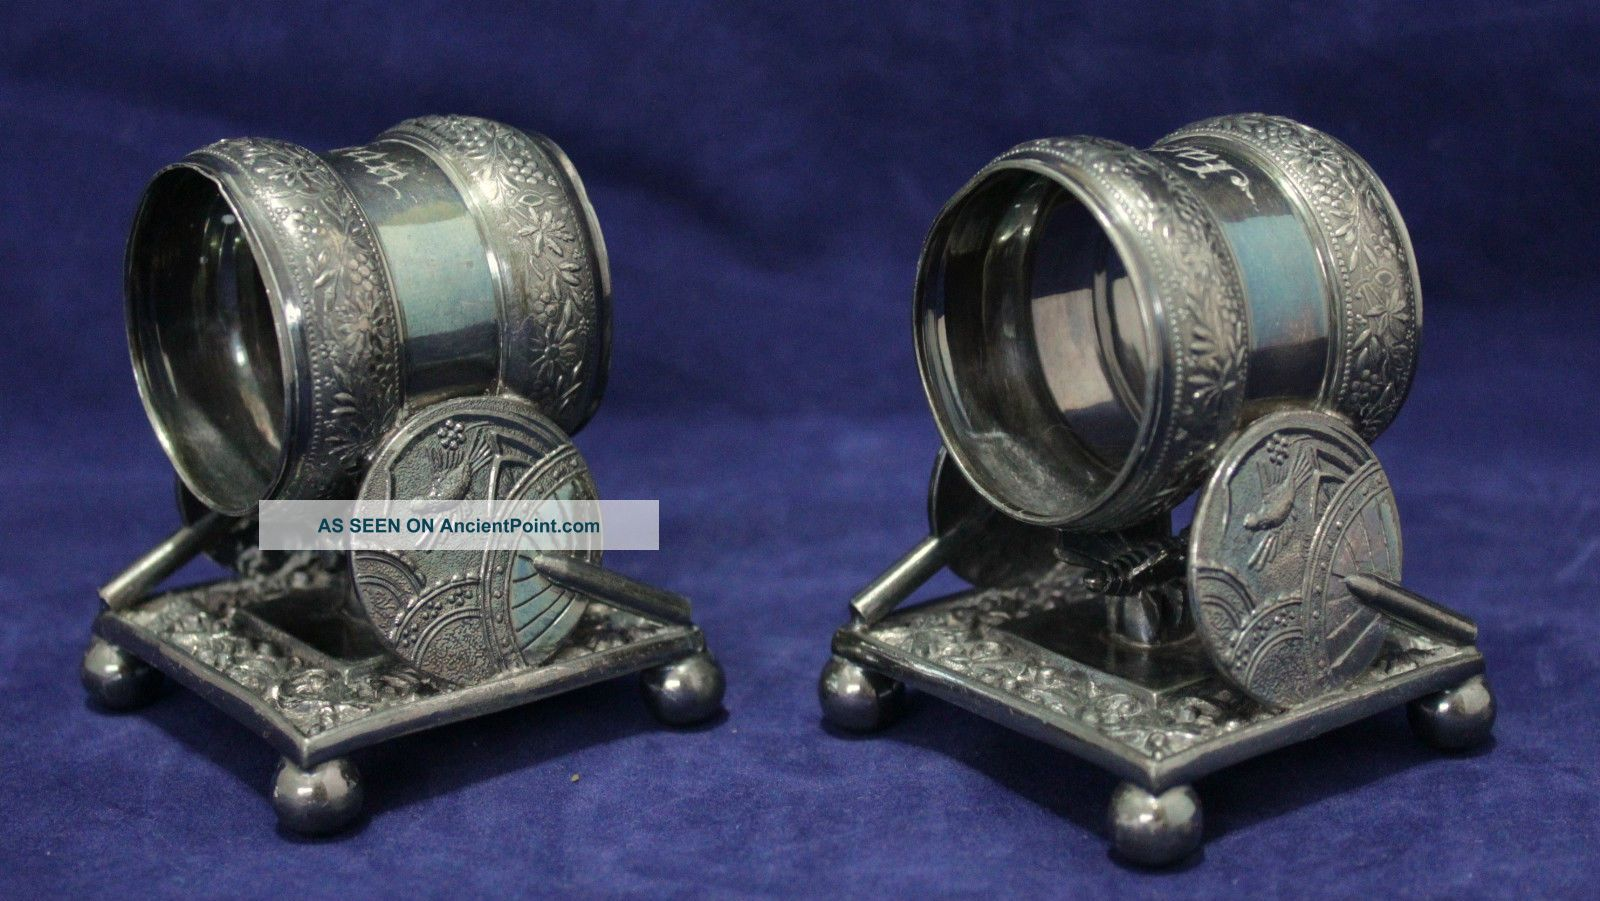 1 Pair Silver Napkin Ring Holders - Meriden B.  Company - Quadruple Plate - 1866, Napkin Rings & Clips photo